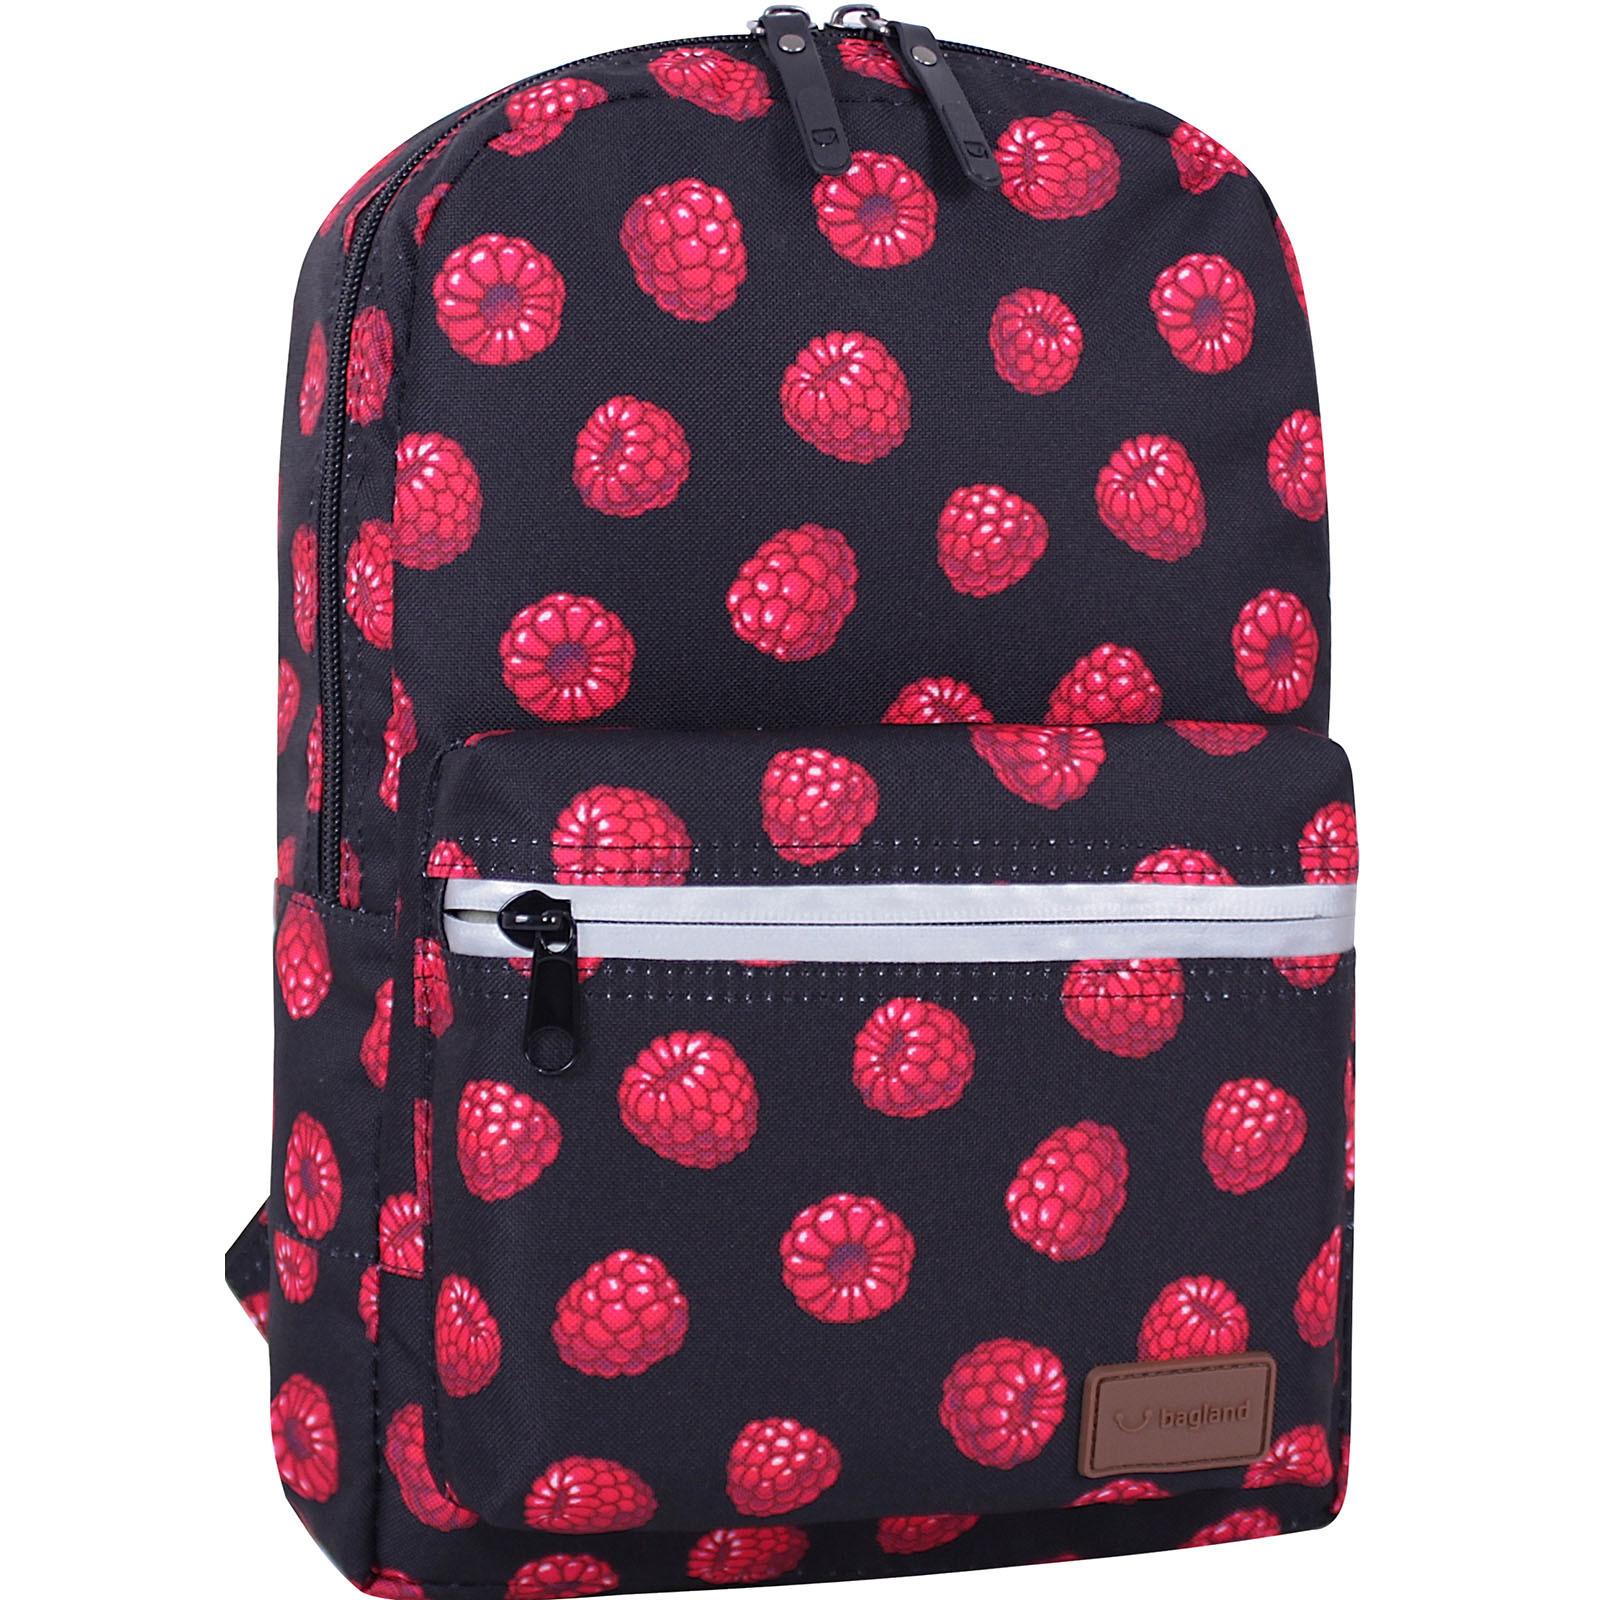 Молодежные рюкзаки Рюкзак Bagland Молодежный mini 8 л. сублимация 761 (00508664) IMG_6866_суб.761_.JPG